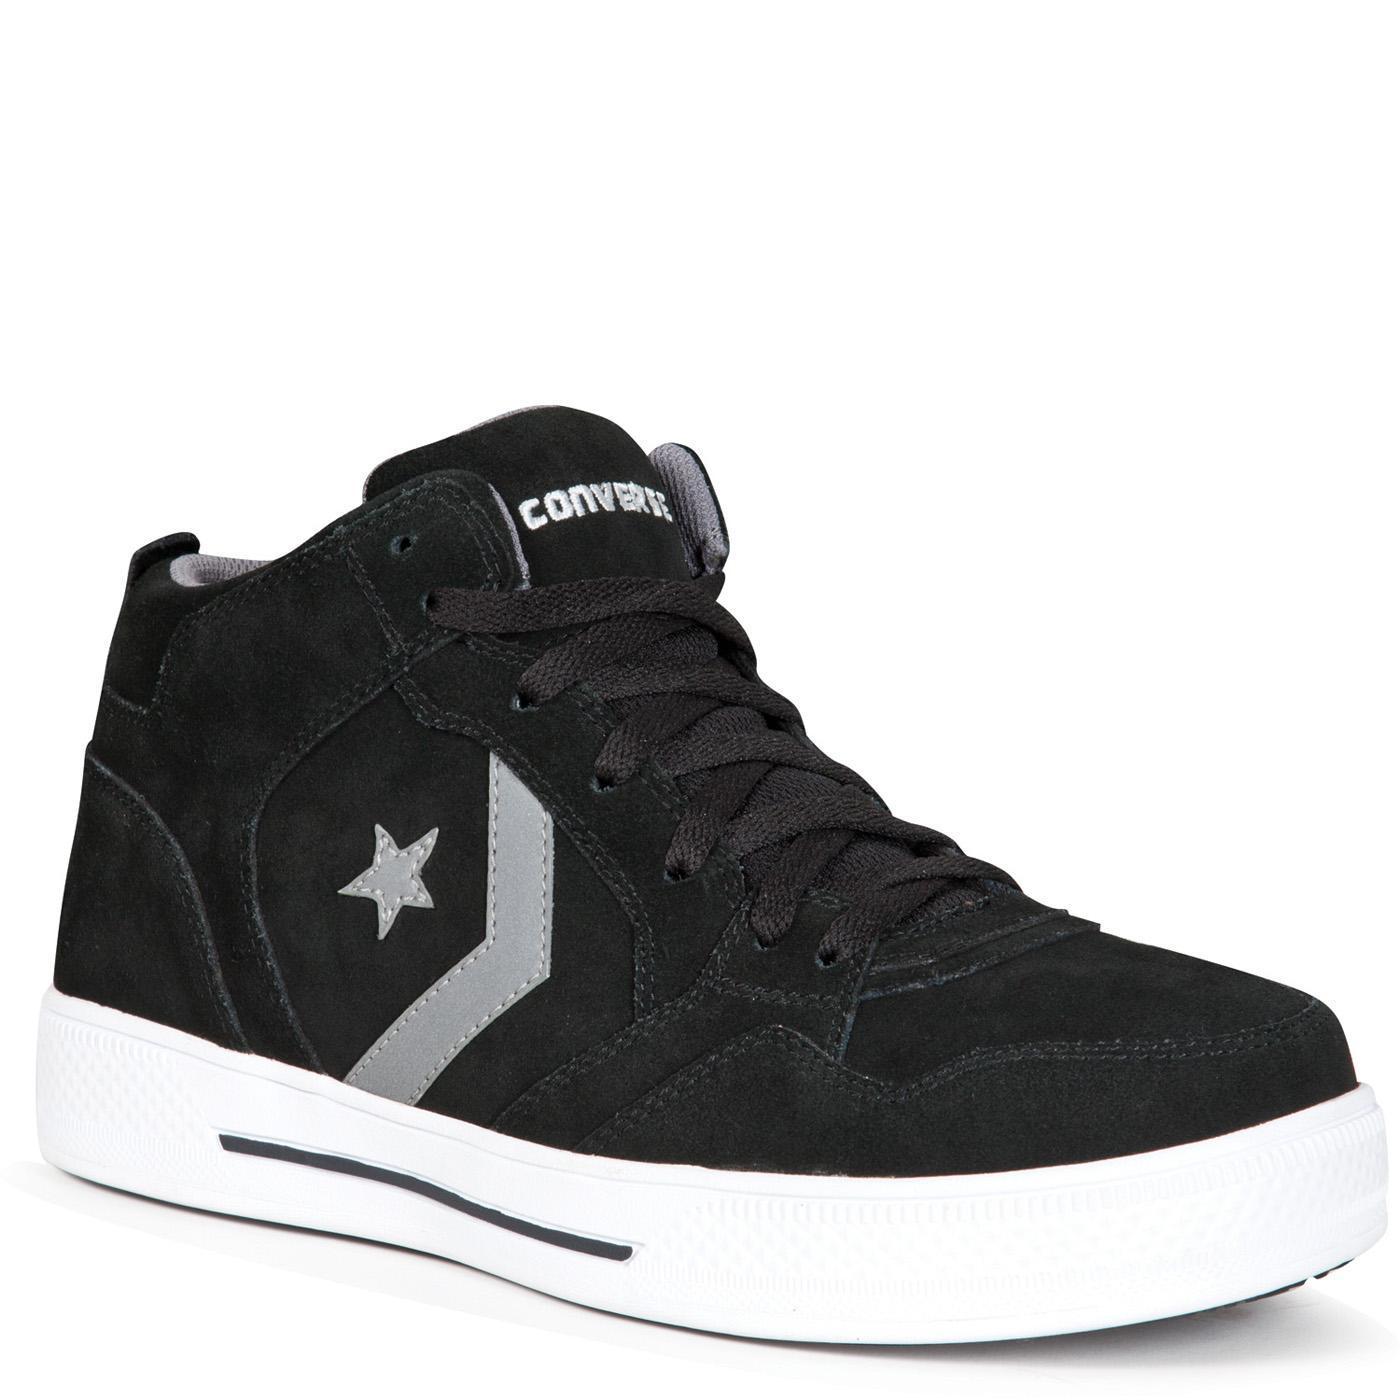 977755576e05a8 Converse Composite Toe MidHi Sport Work ShoeConverse Composite Toe MidHi  Sport Work Shoe